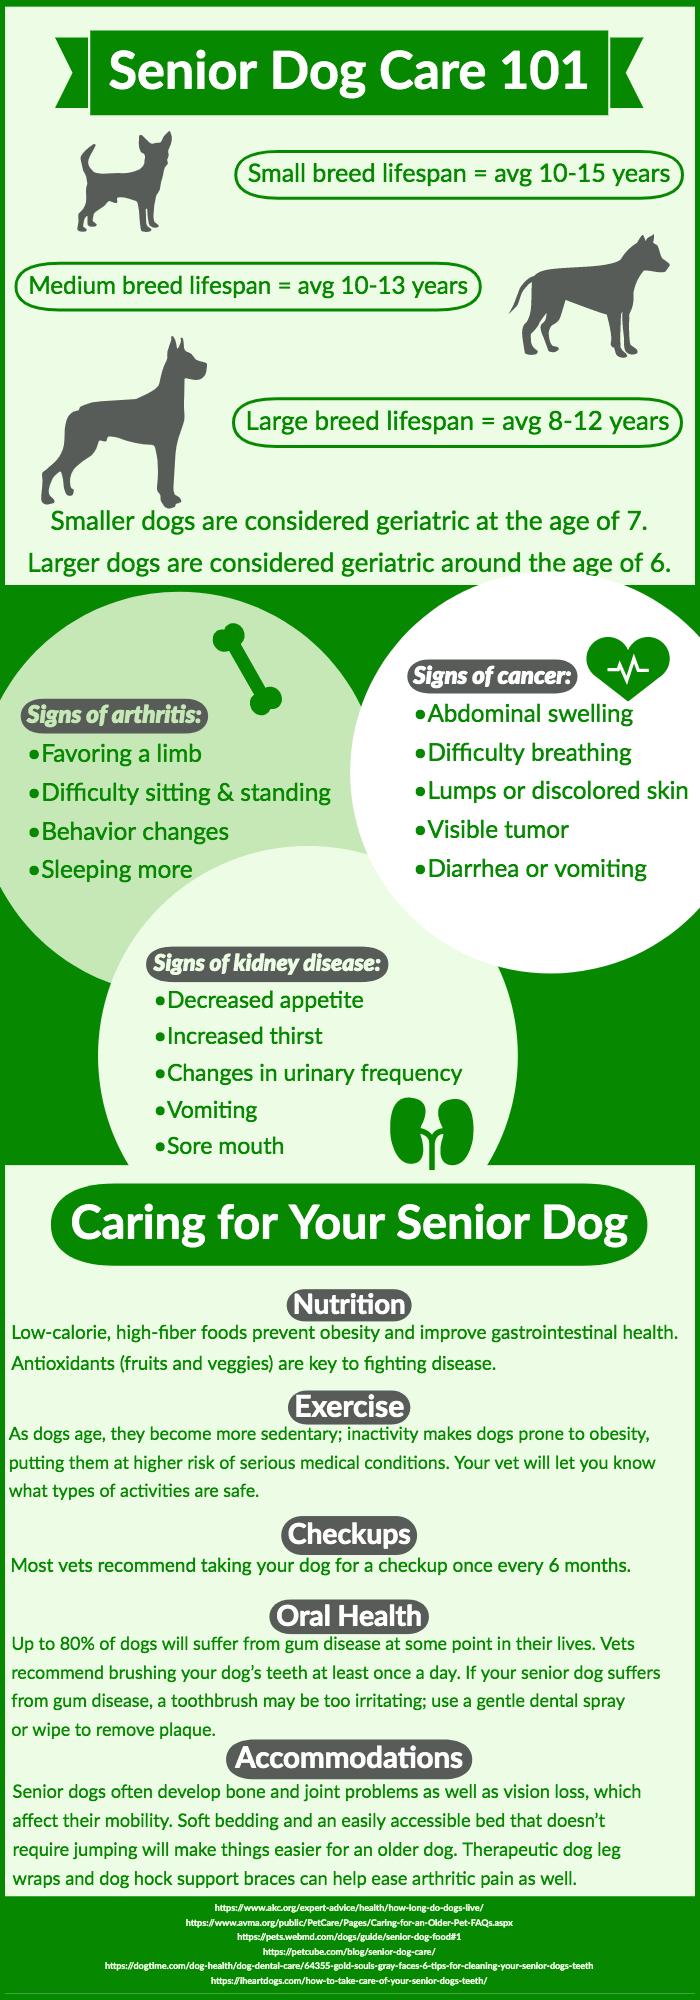 Senior Dog Care 101